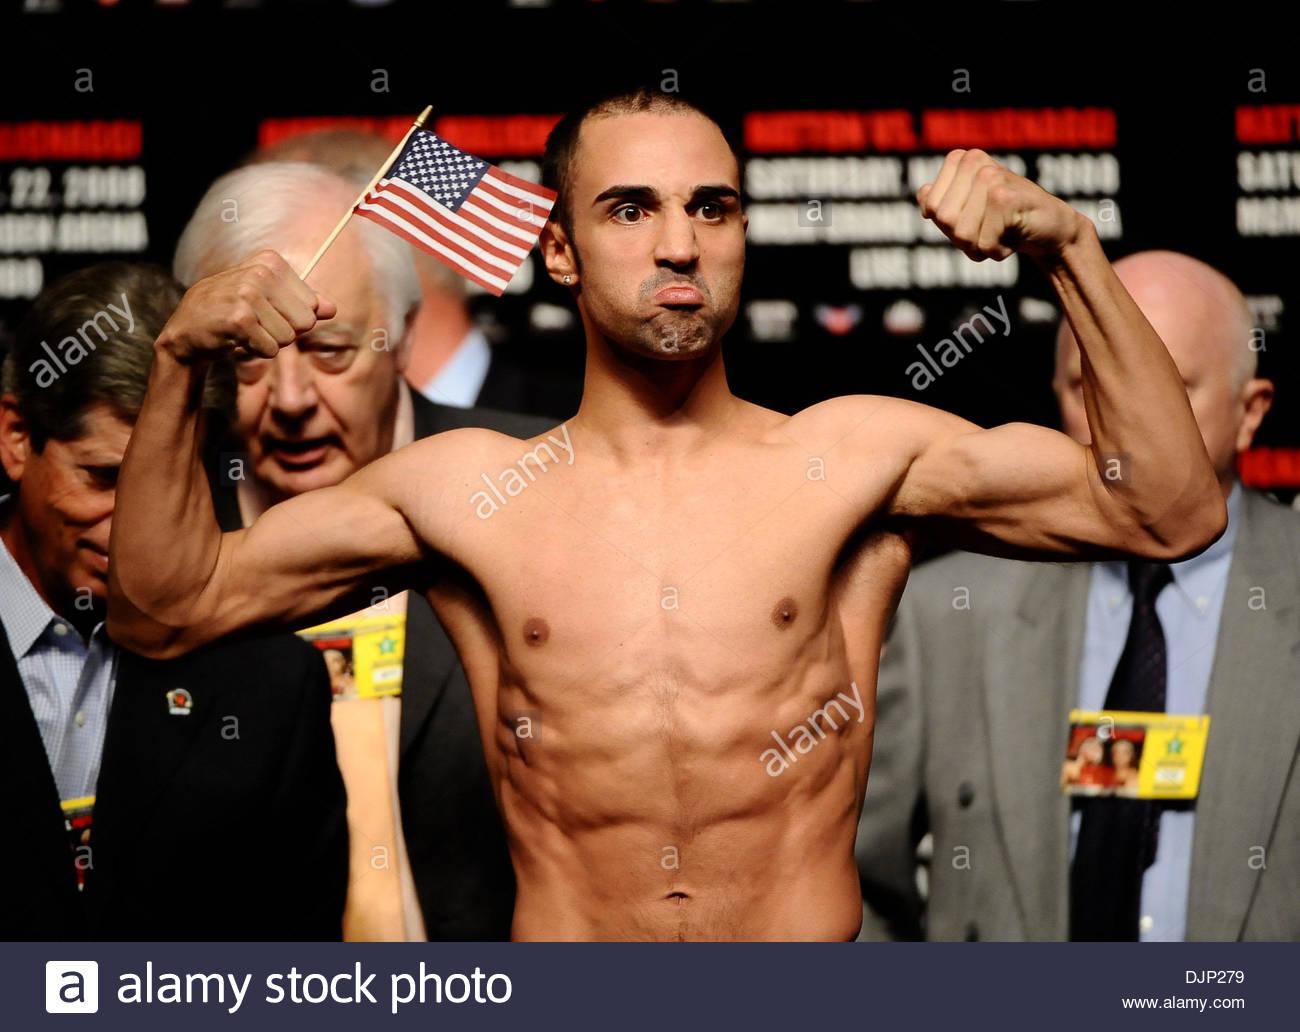 Nov 21, 2008 - Las Vegas, Nevada, USA - PAULIE MALIGNAGGI weighs in